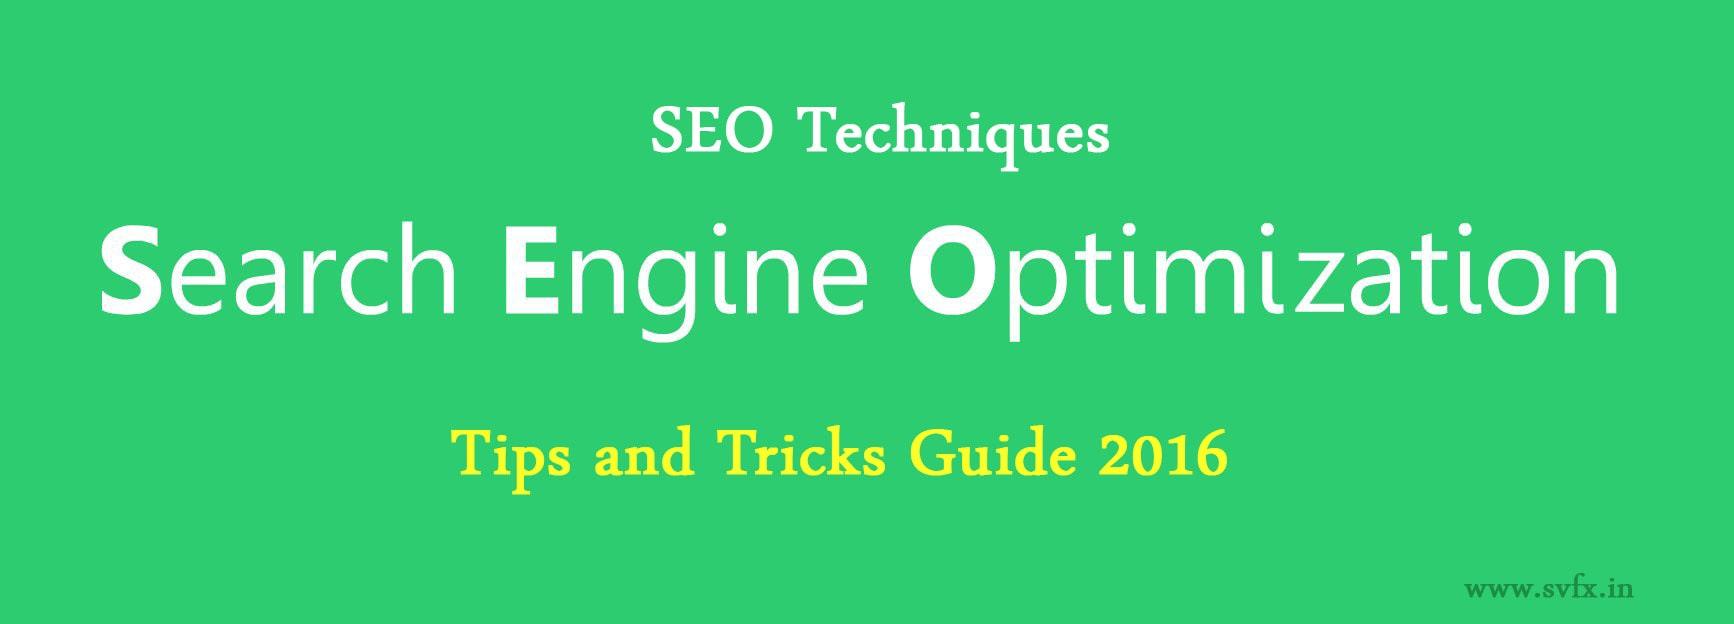 Search Engine Optimization Techniques 2016